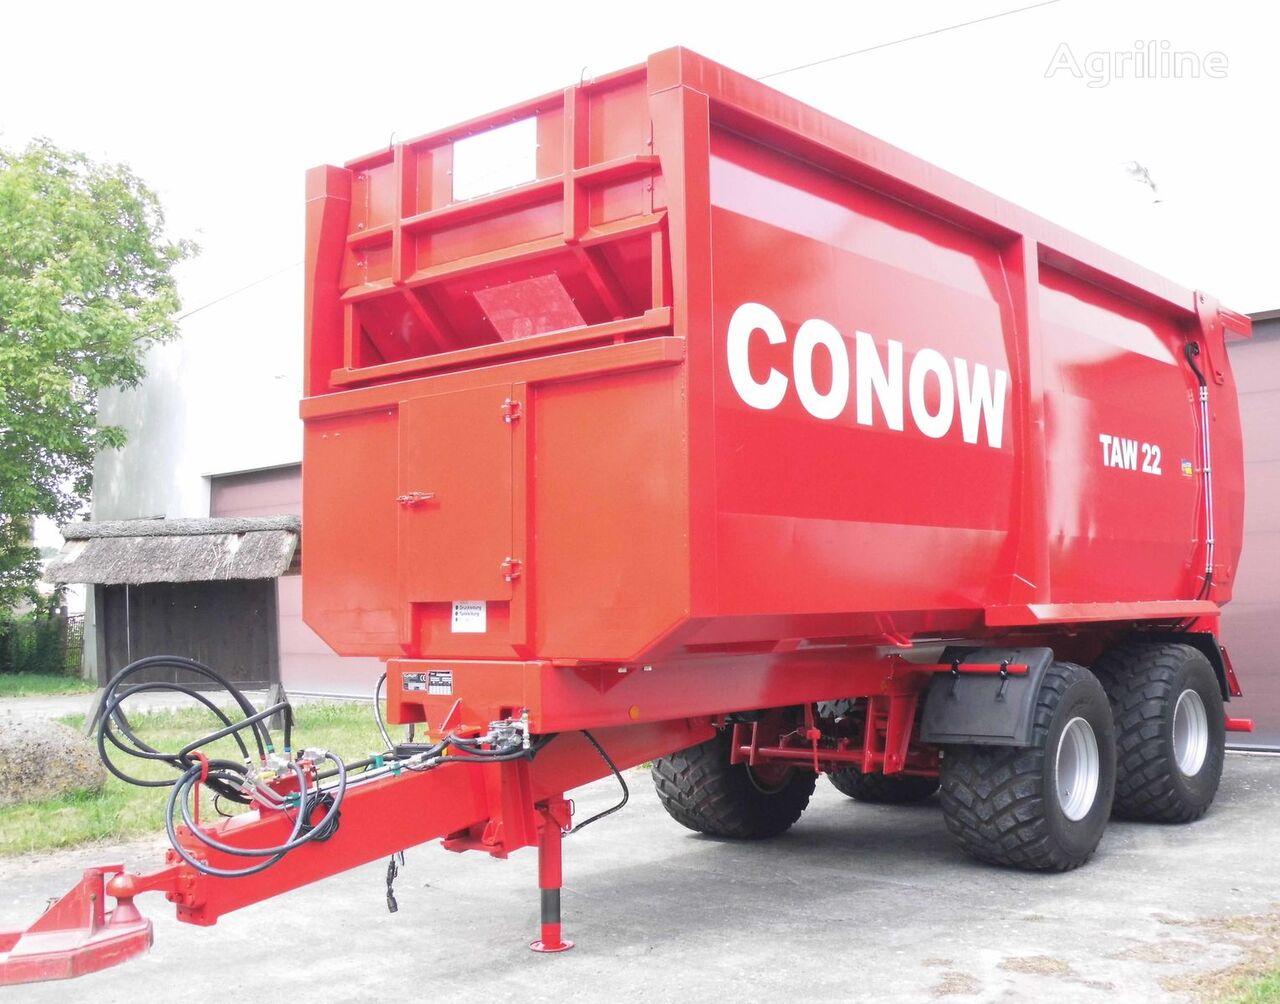 new CONOW TAW 22 tractor trailer